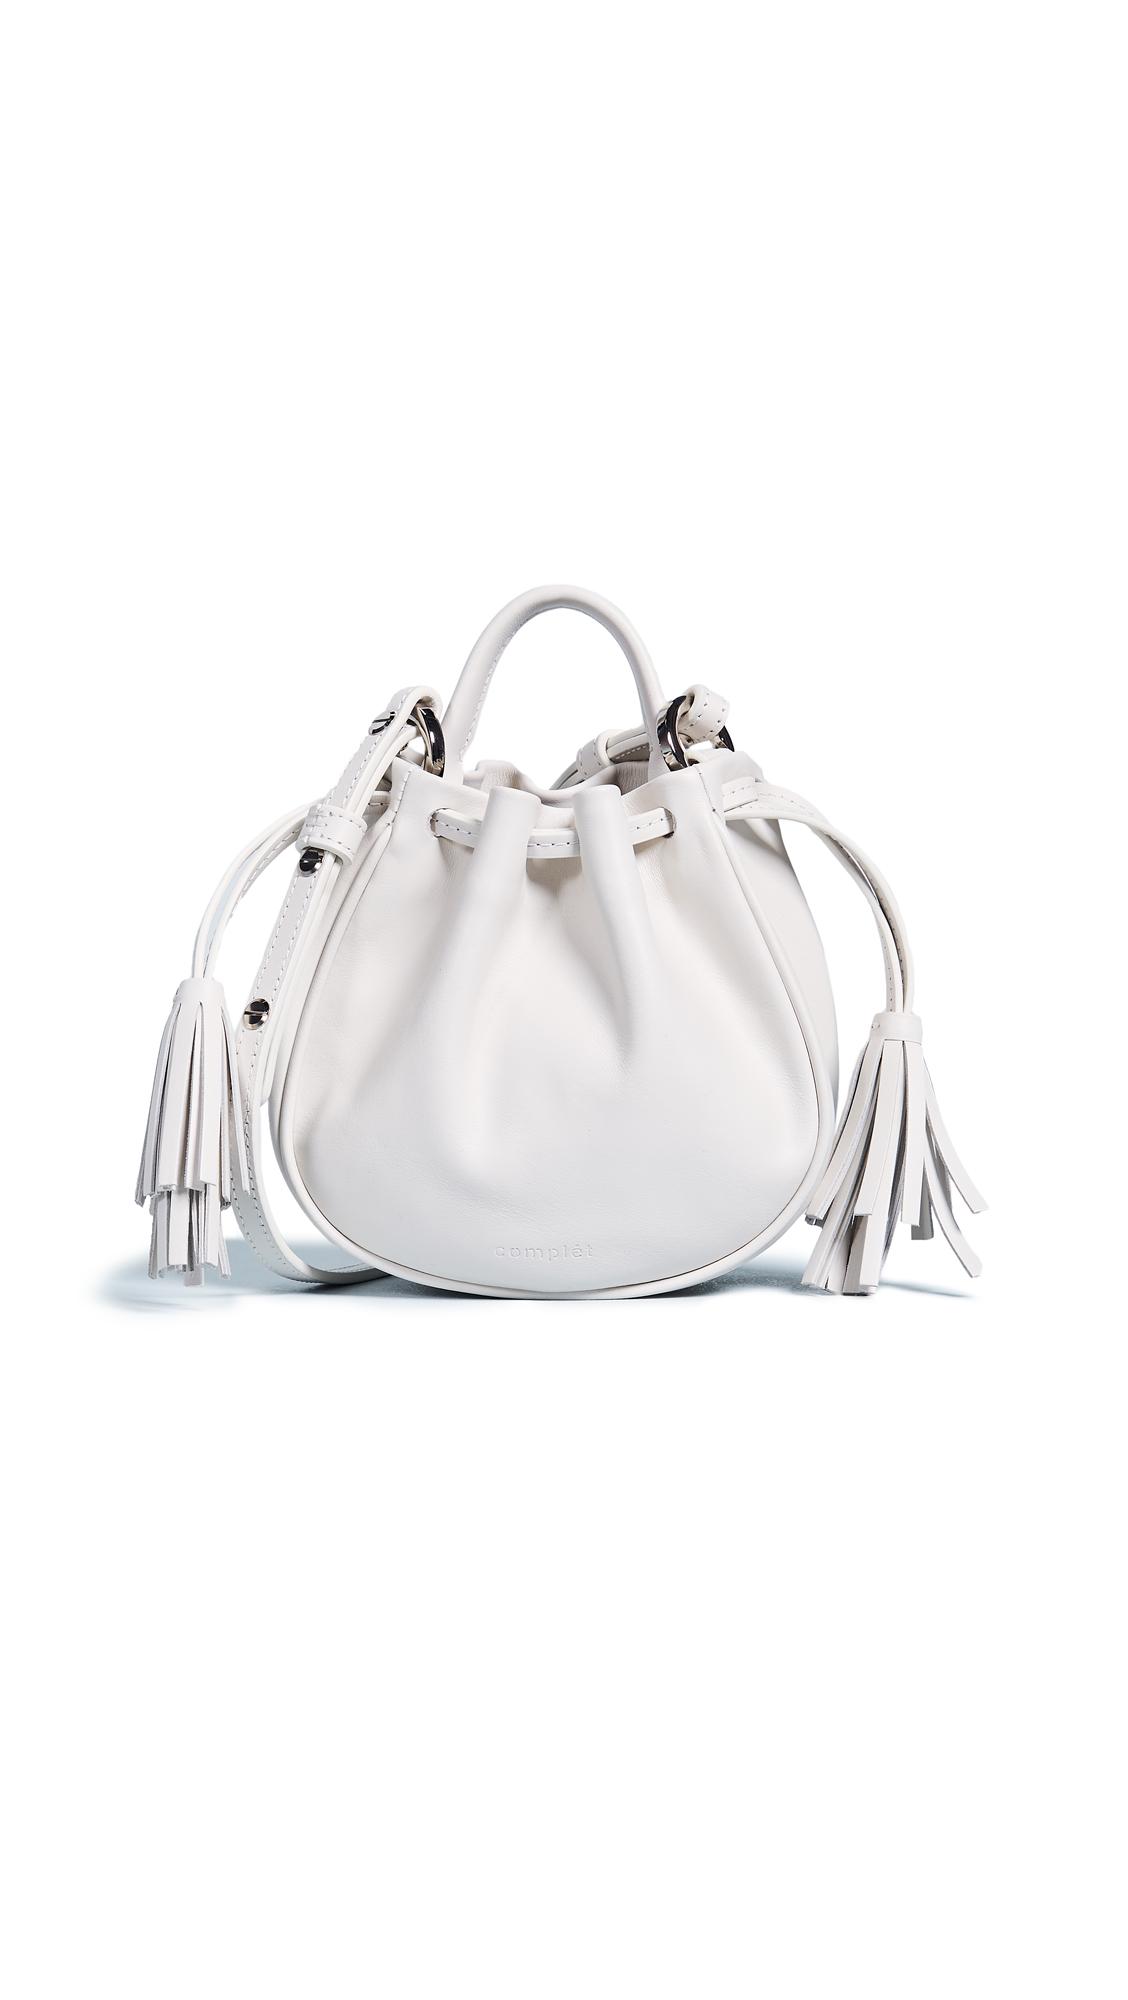 Complet Gaia Micro Cross Body Bag